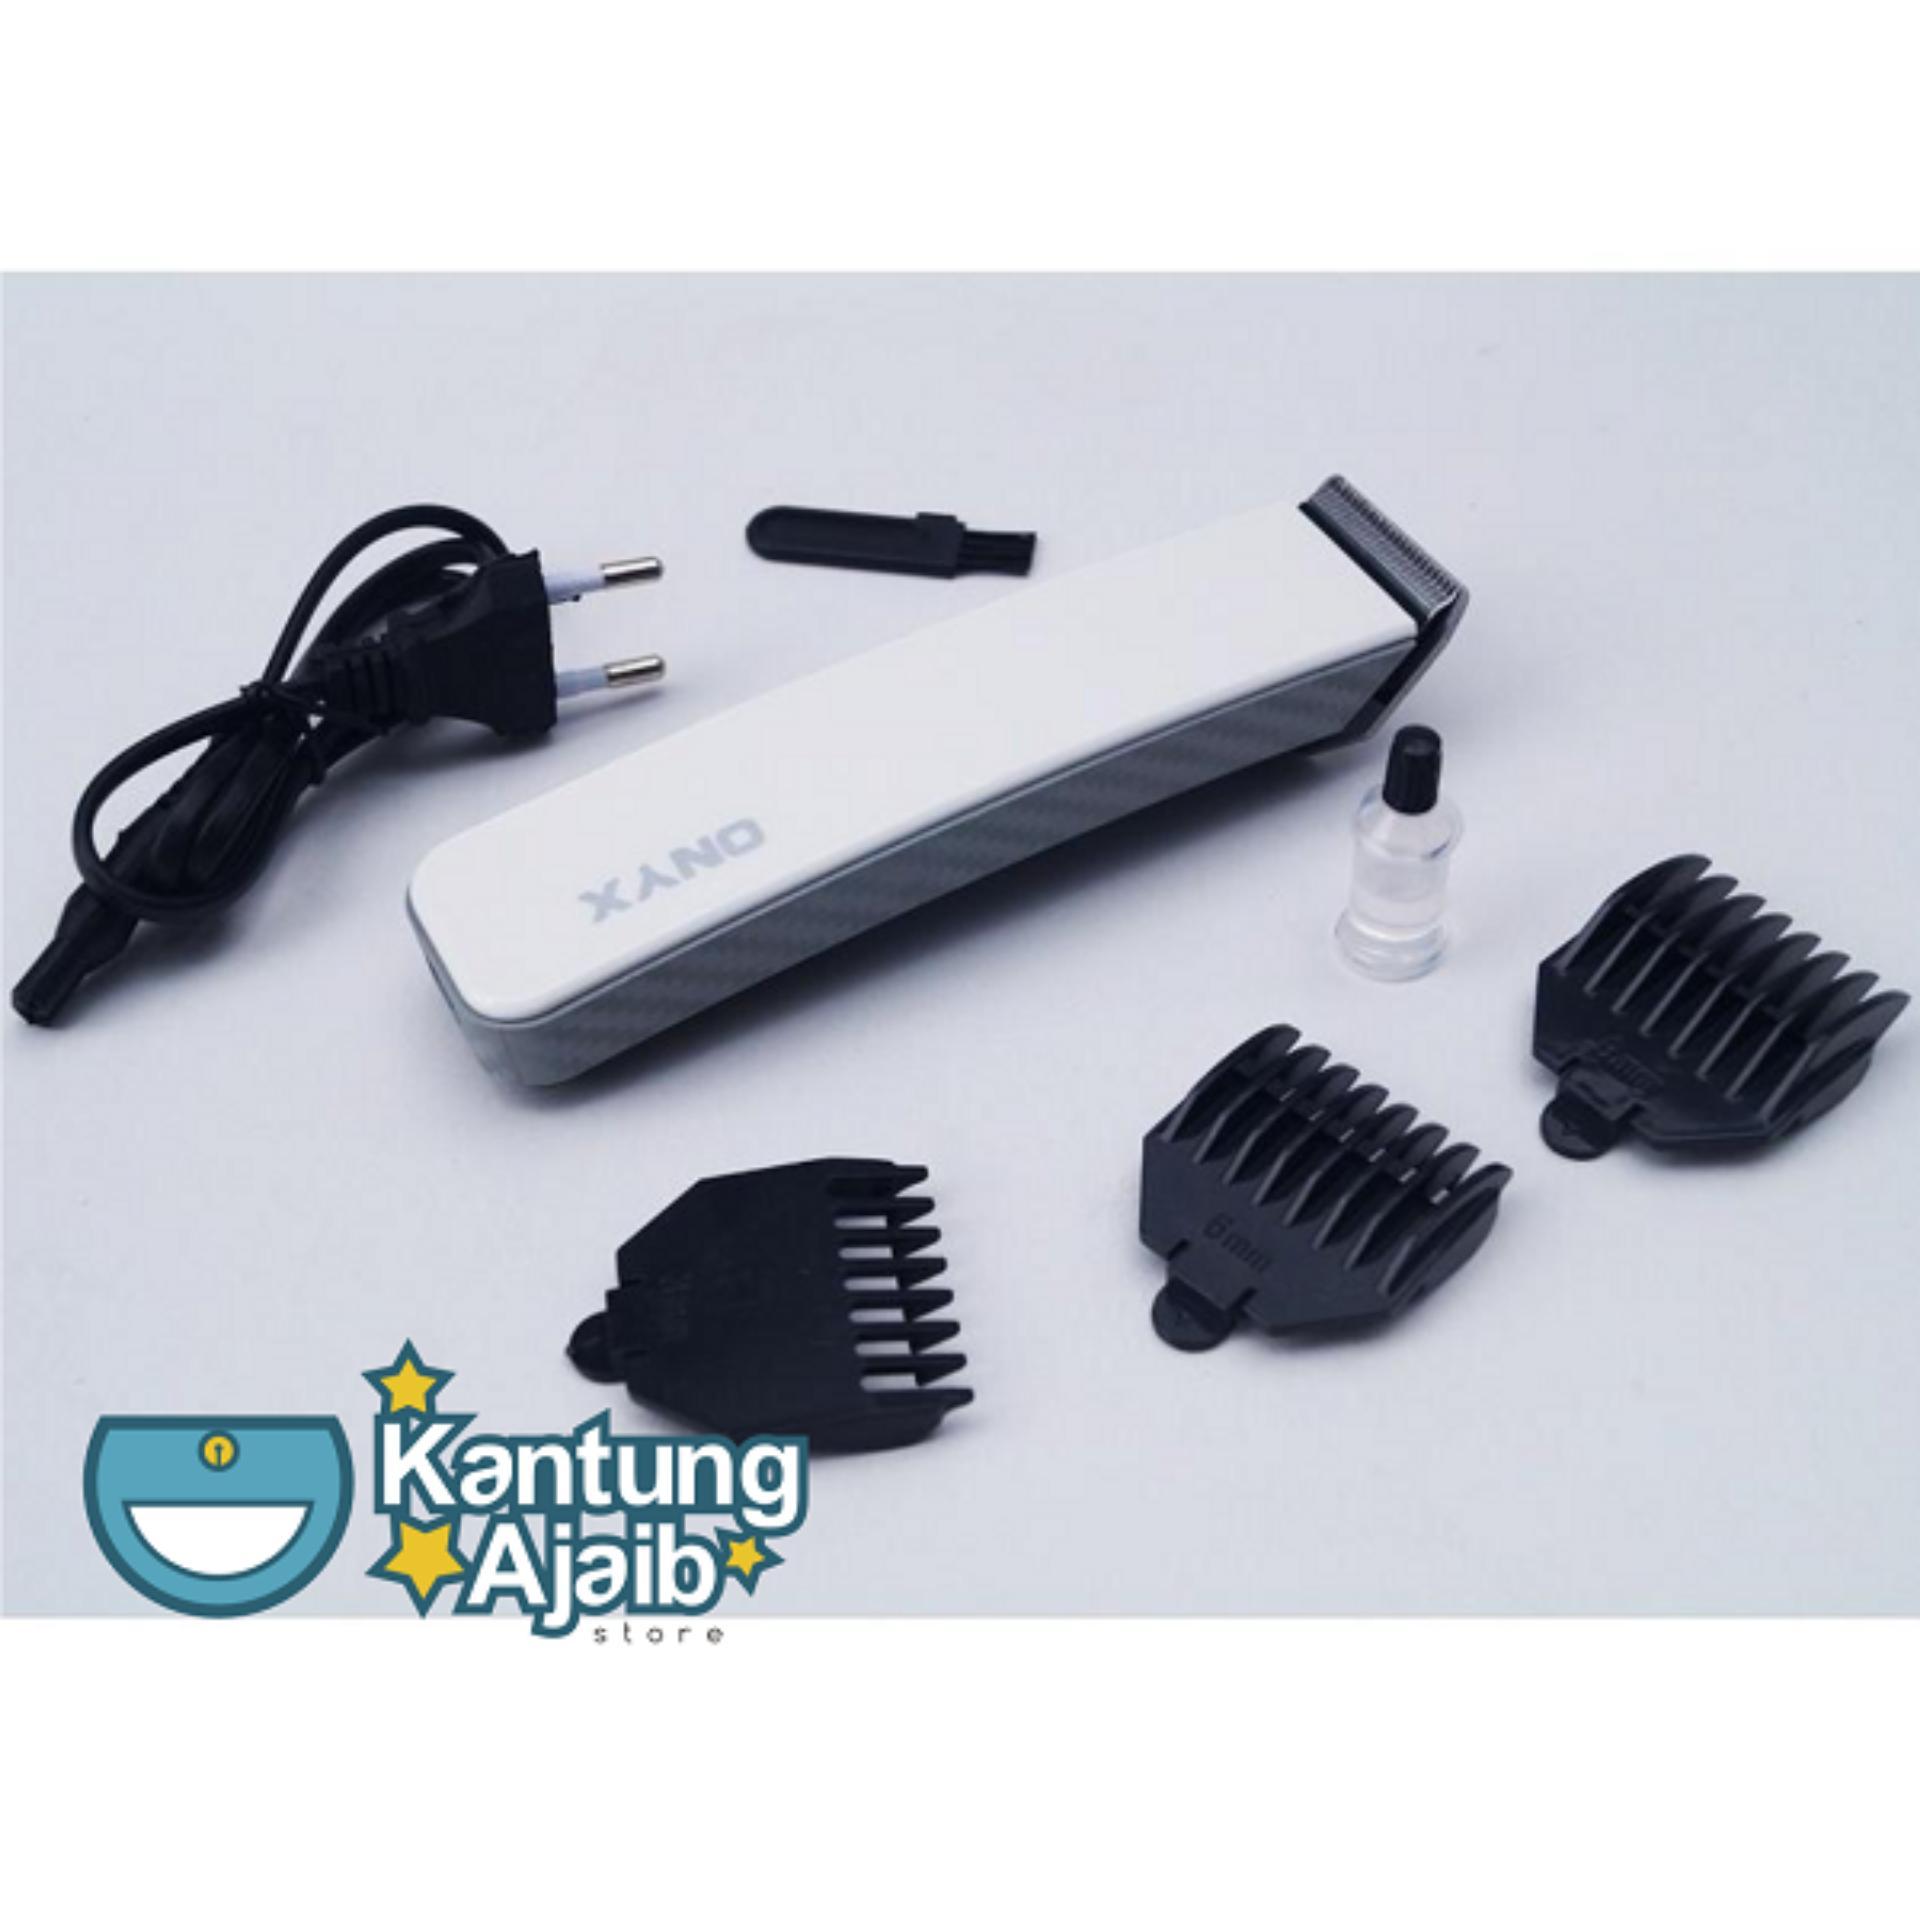 Alat Cukur Rambut Elektrik Hair Trimmer Set Nova Ns 216 Onyx Ox 216 ... 3716cf2170